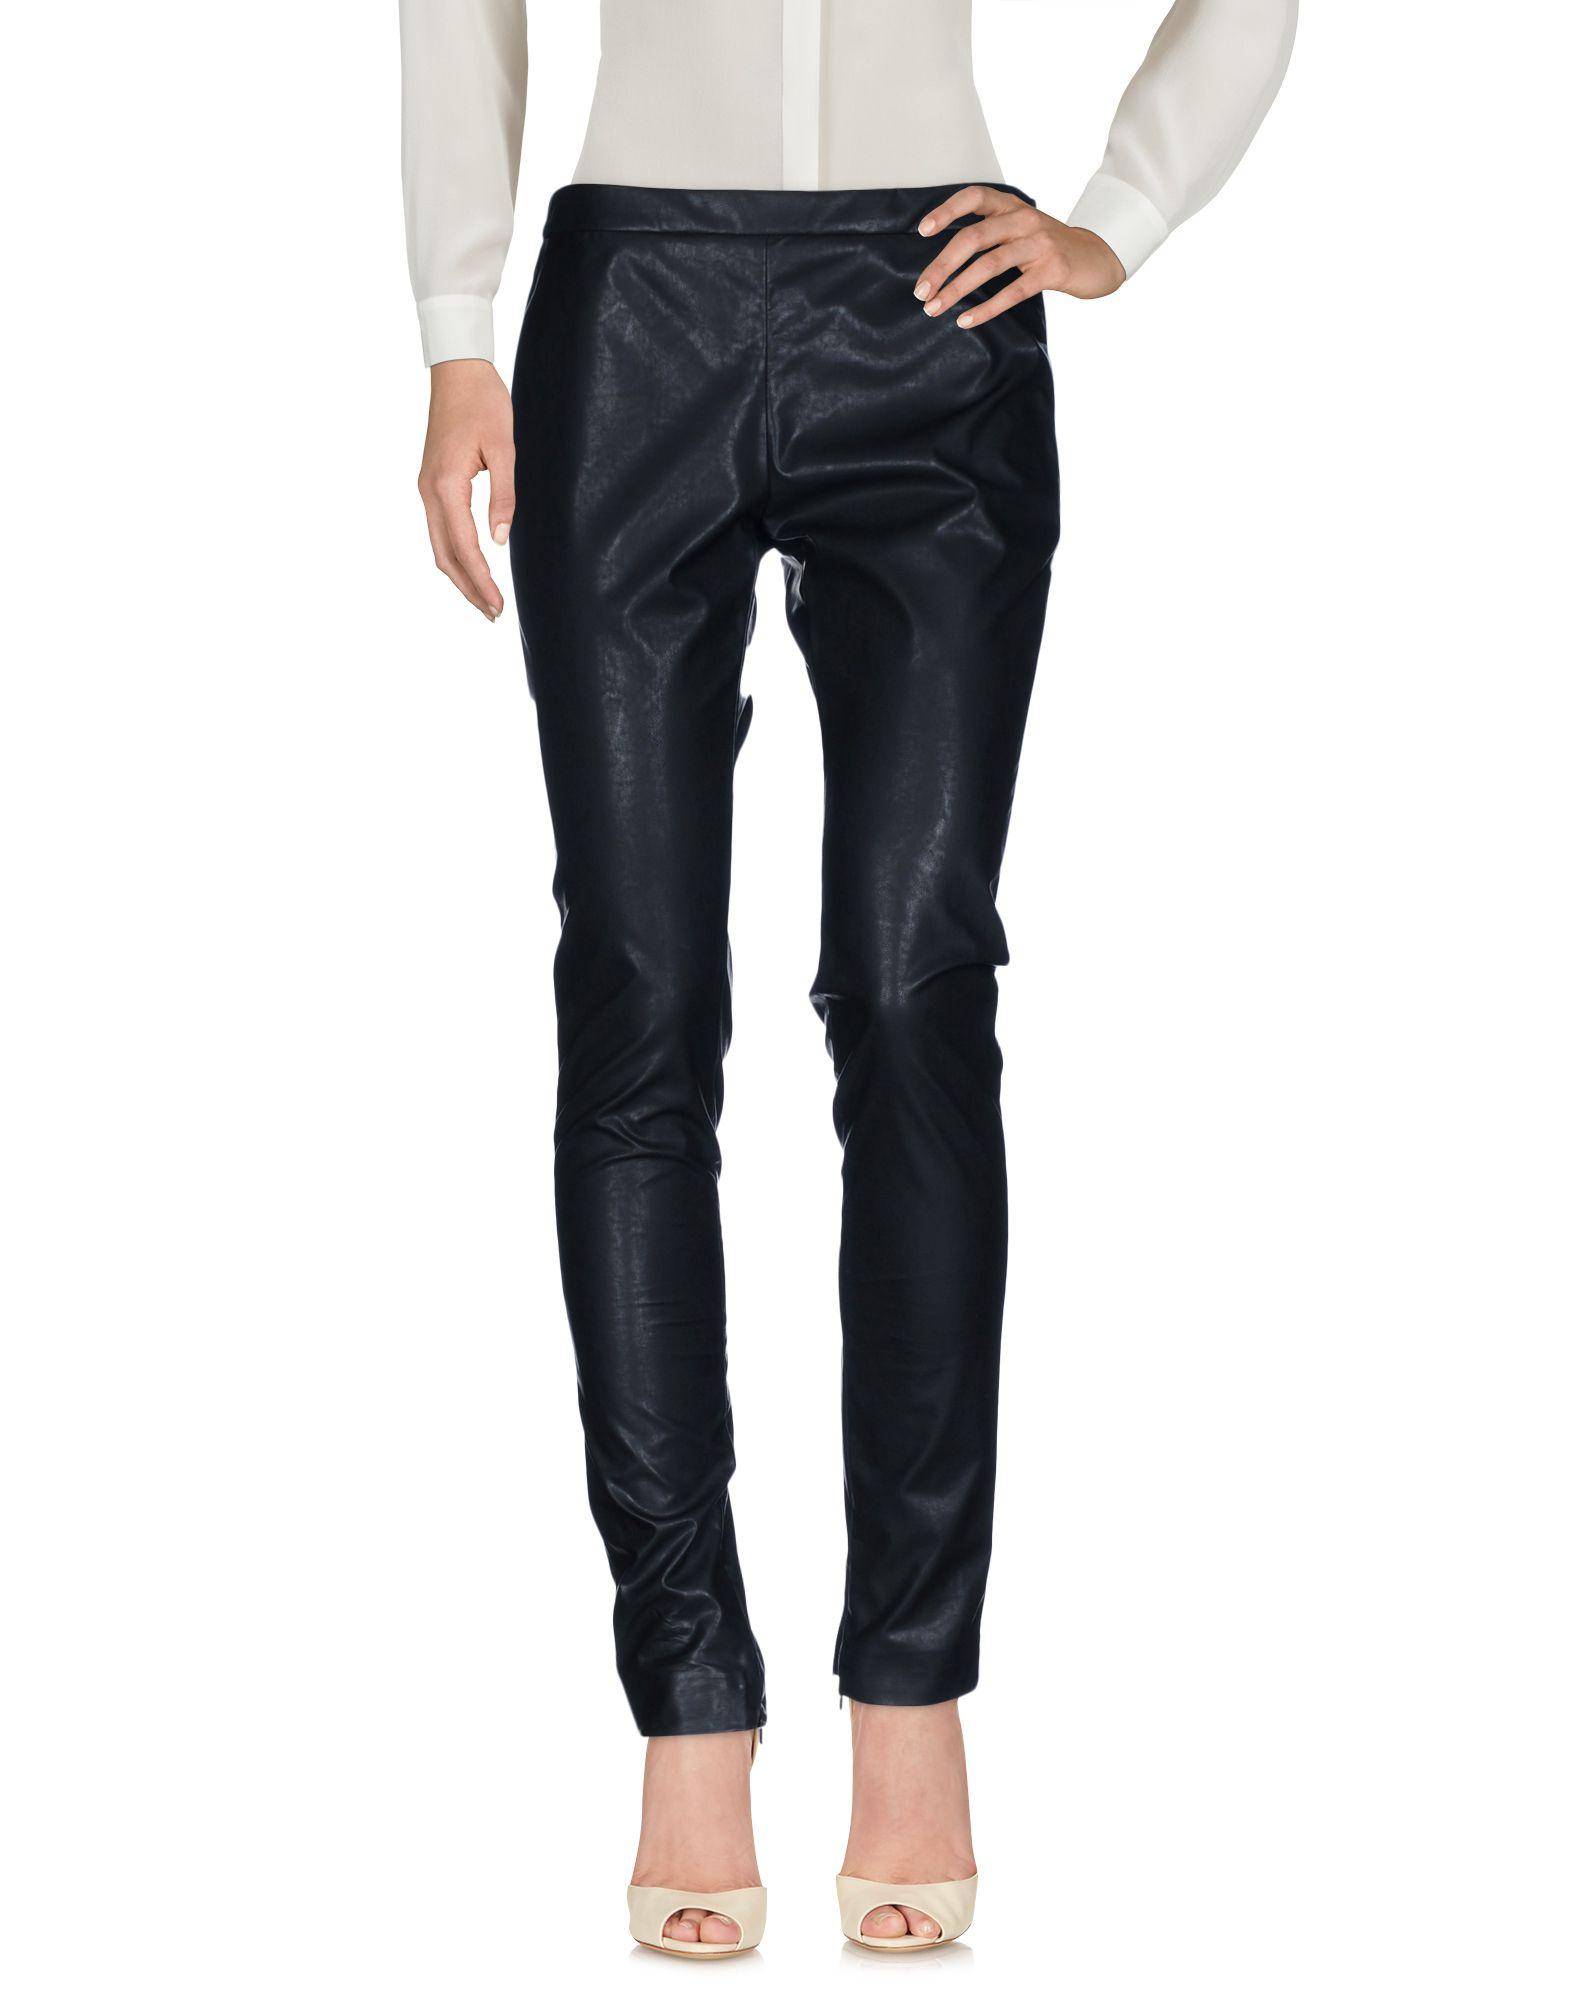 Pantalone Msgm donna donna donna - 13108400PJ 32f